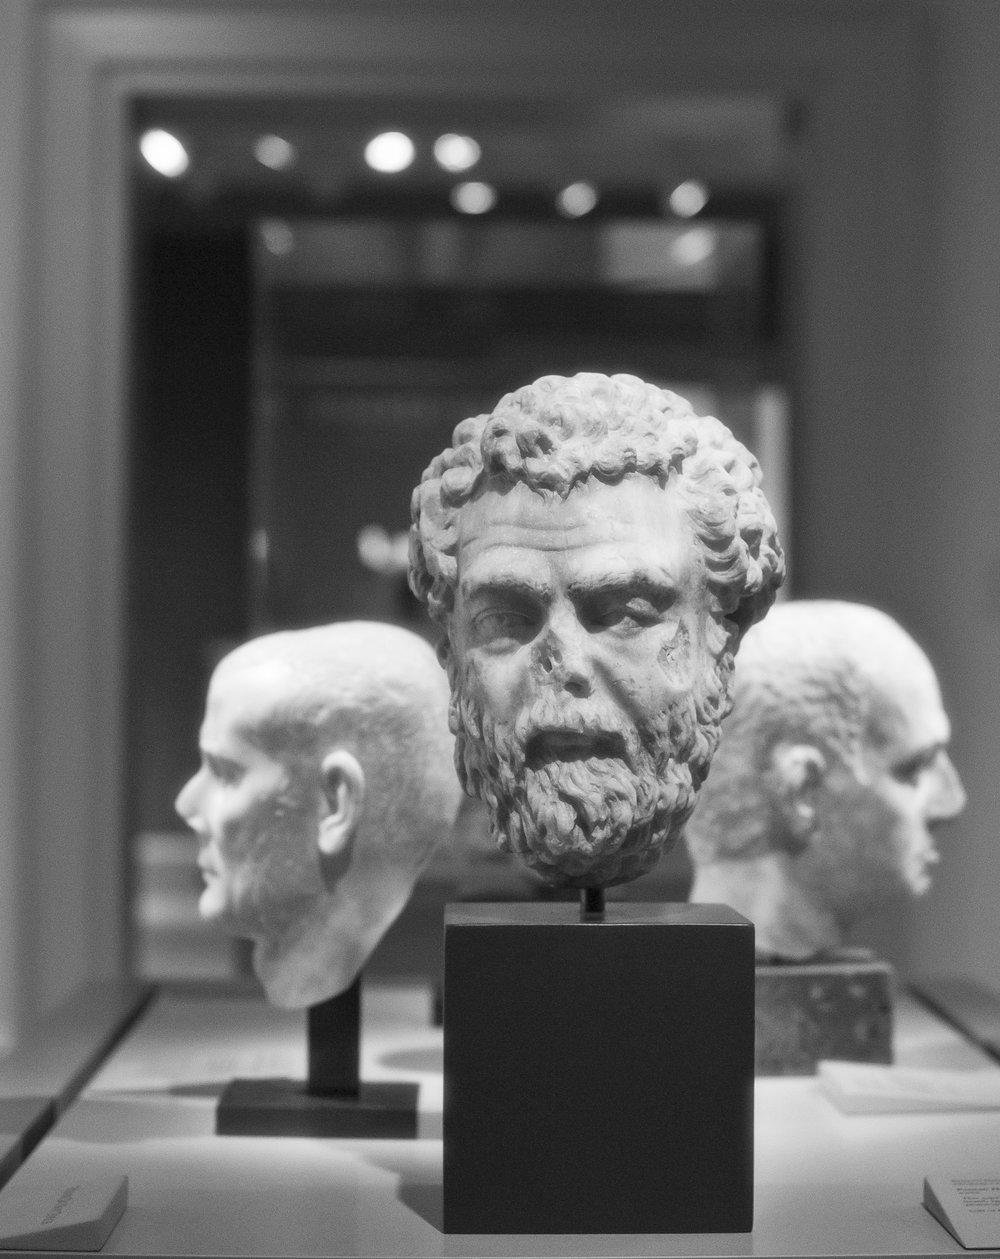 Columbia_SC_ArtMuseum_Heads_1272013.jpg